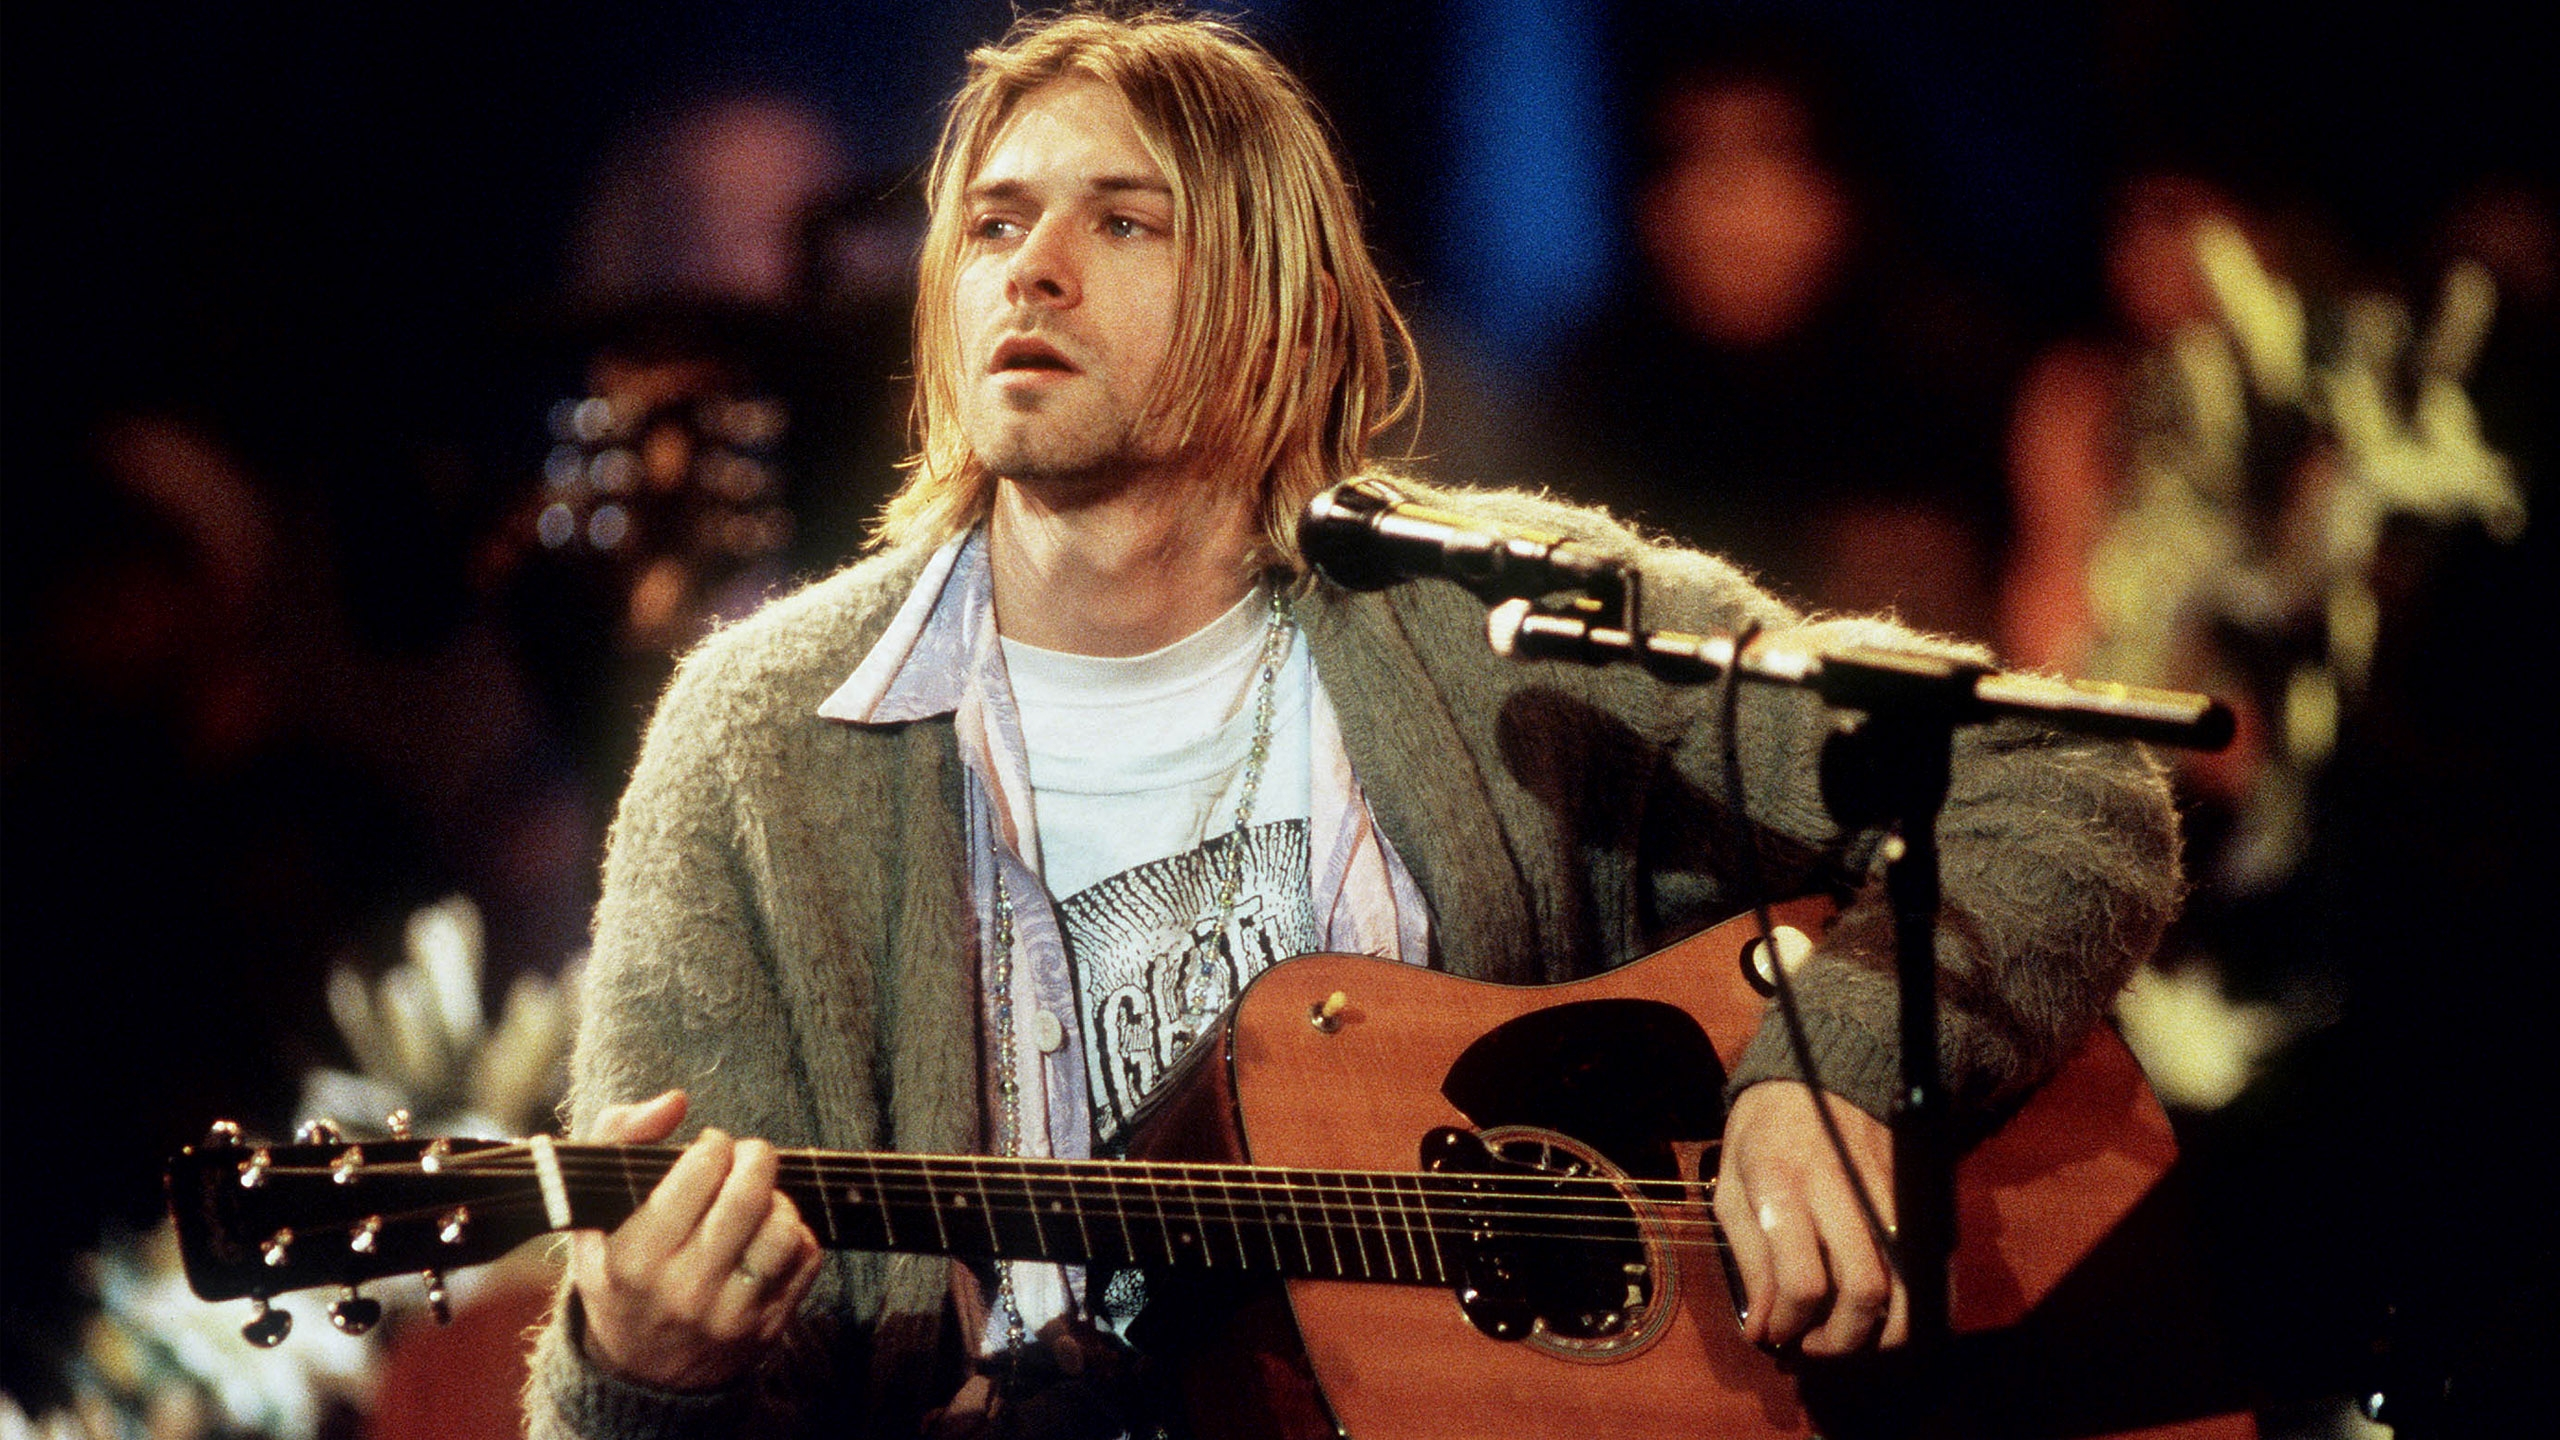 Kurt Cobain Wallpaper 6832944 2560x1440